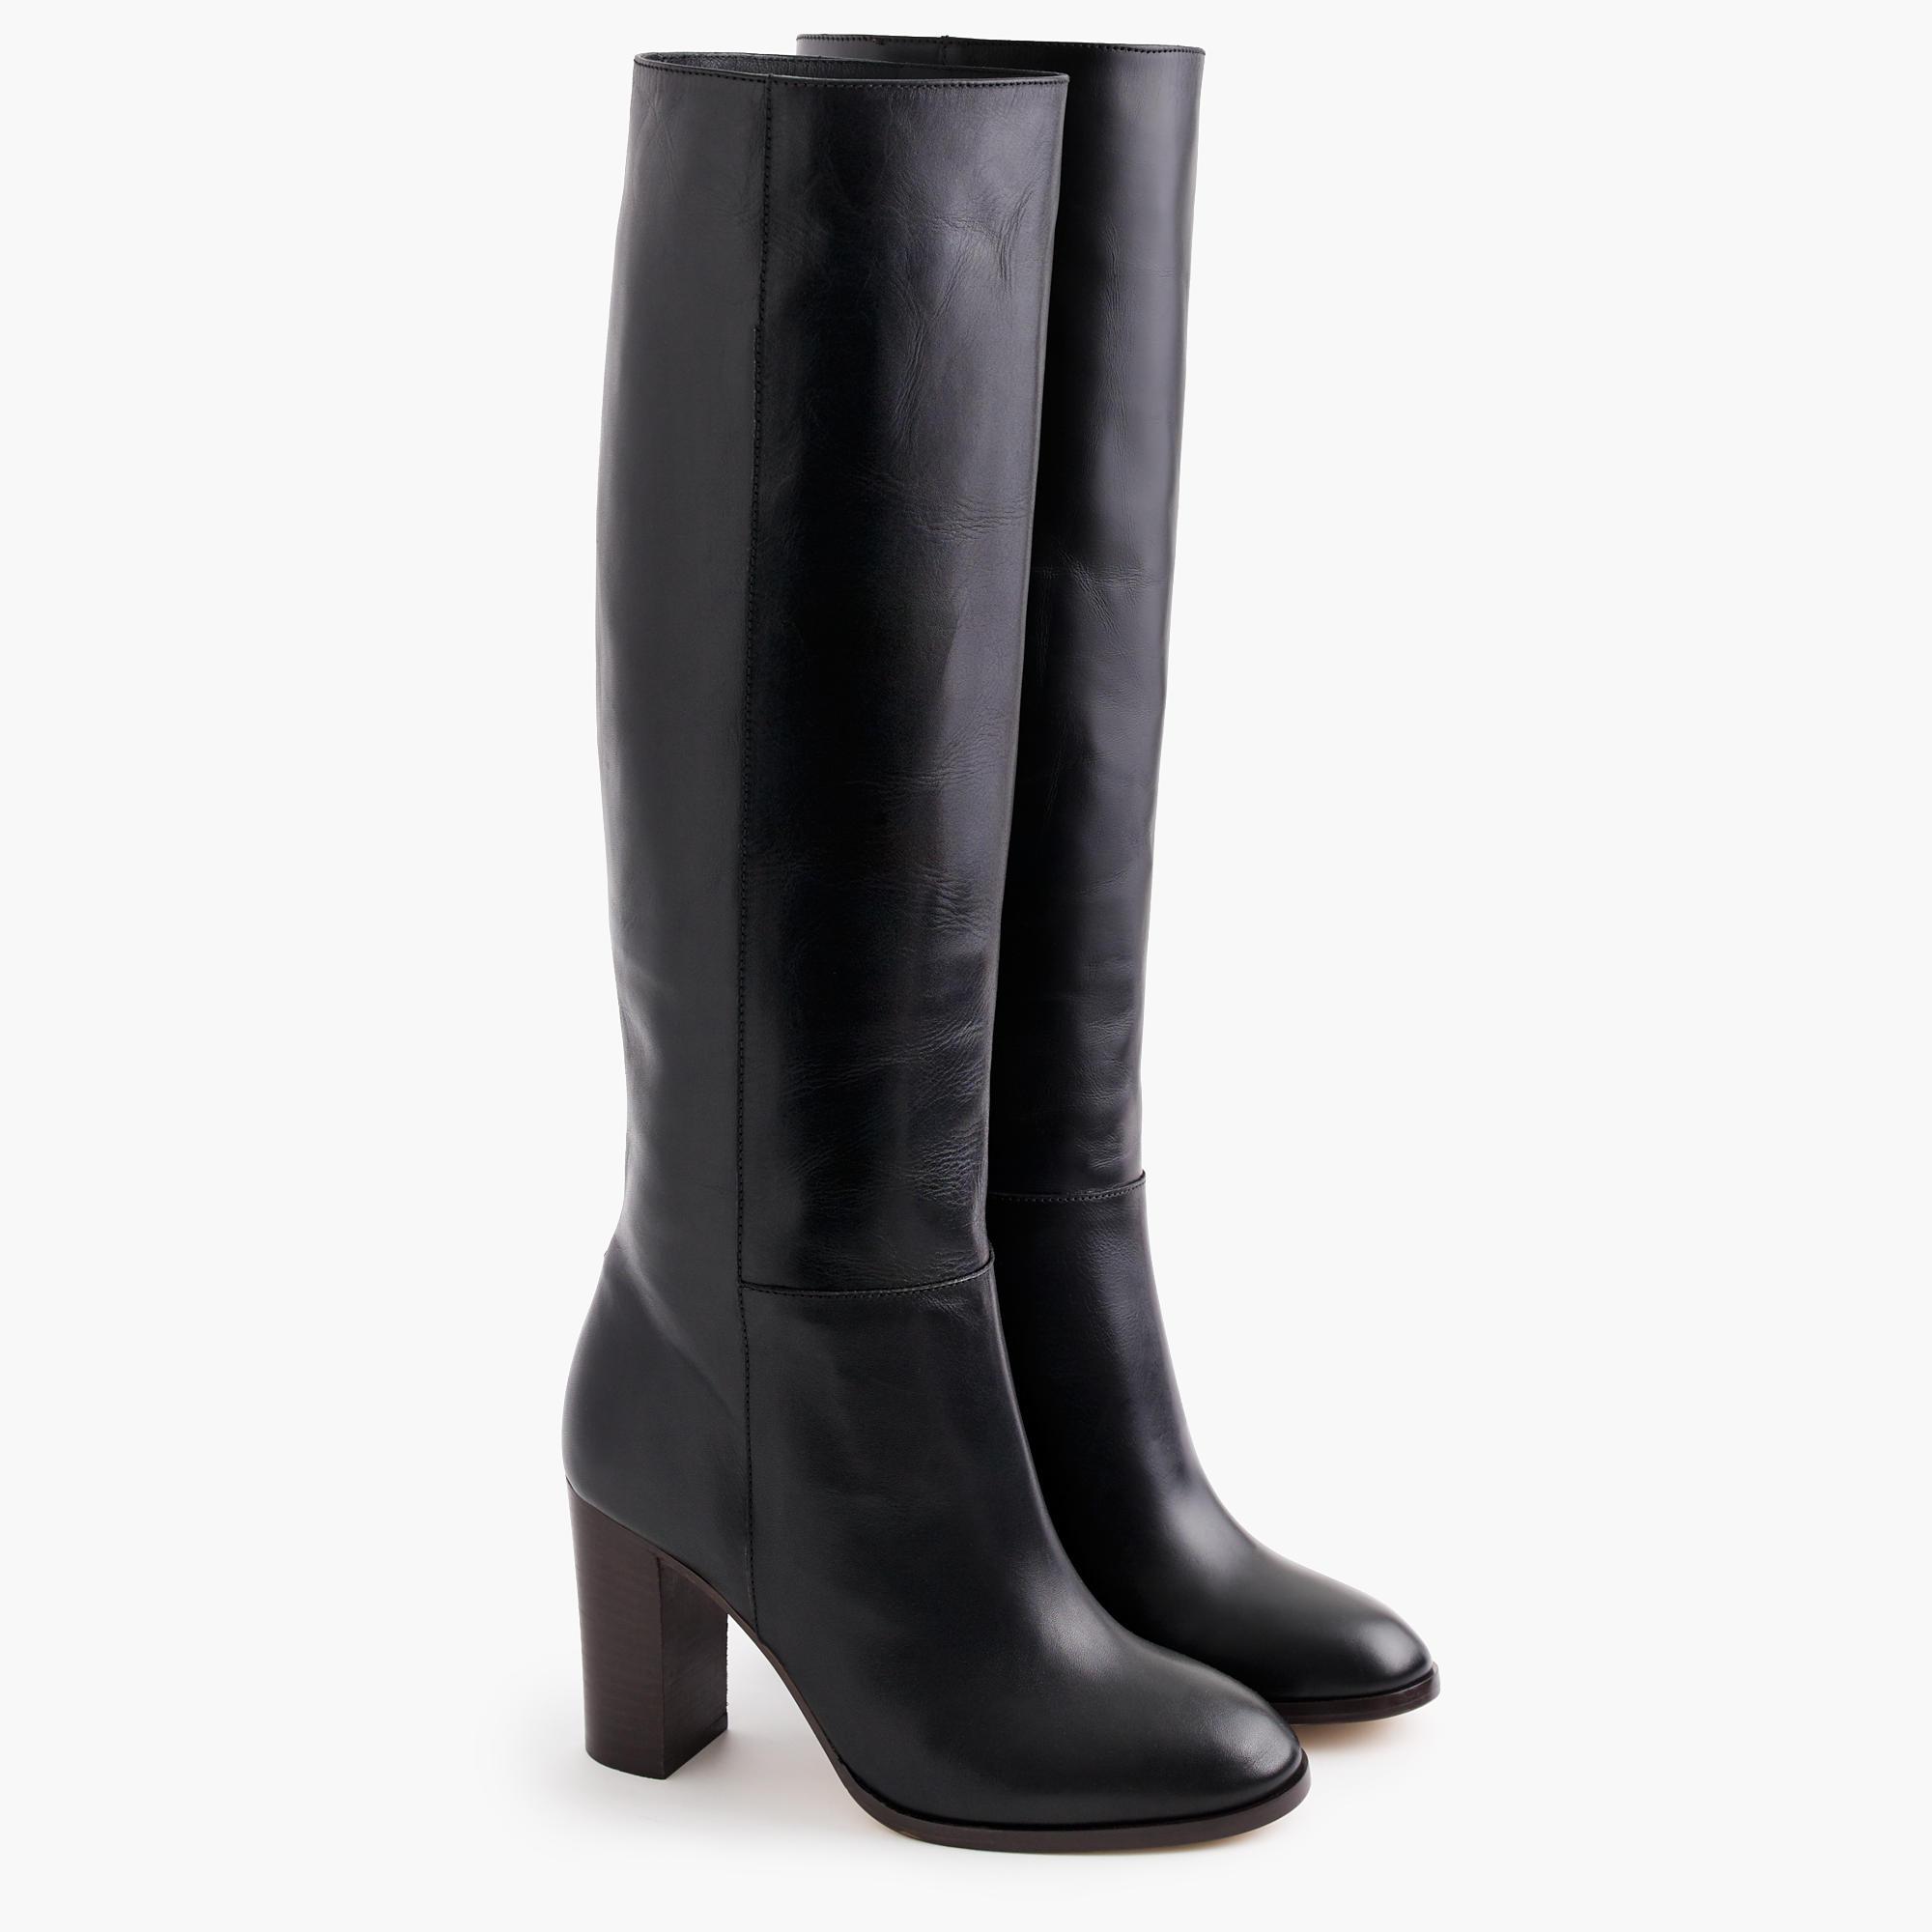 High-Heel Knee Boots In Leather : Women's Boots | J.Crew